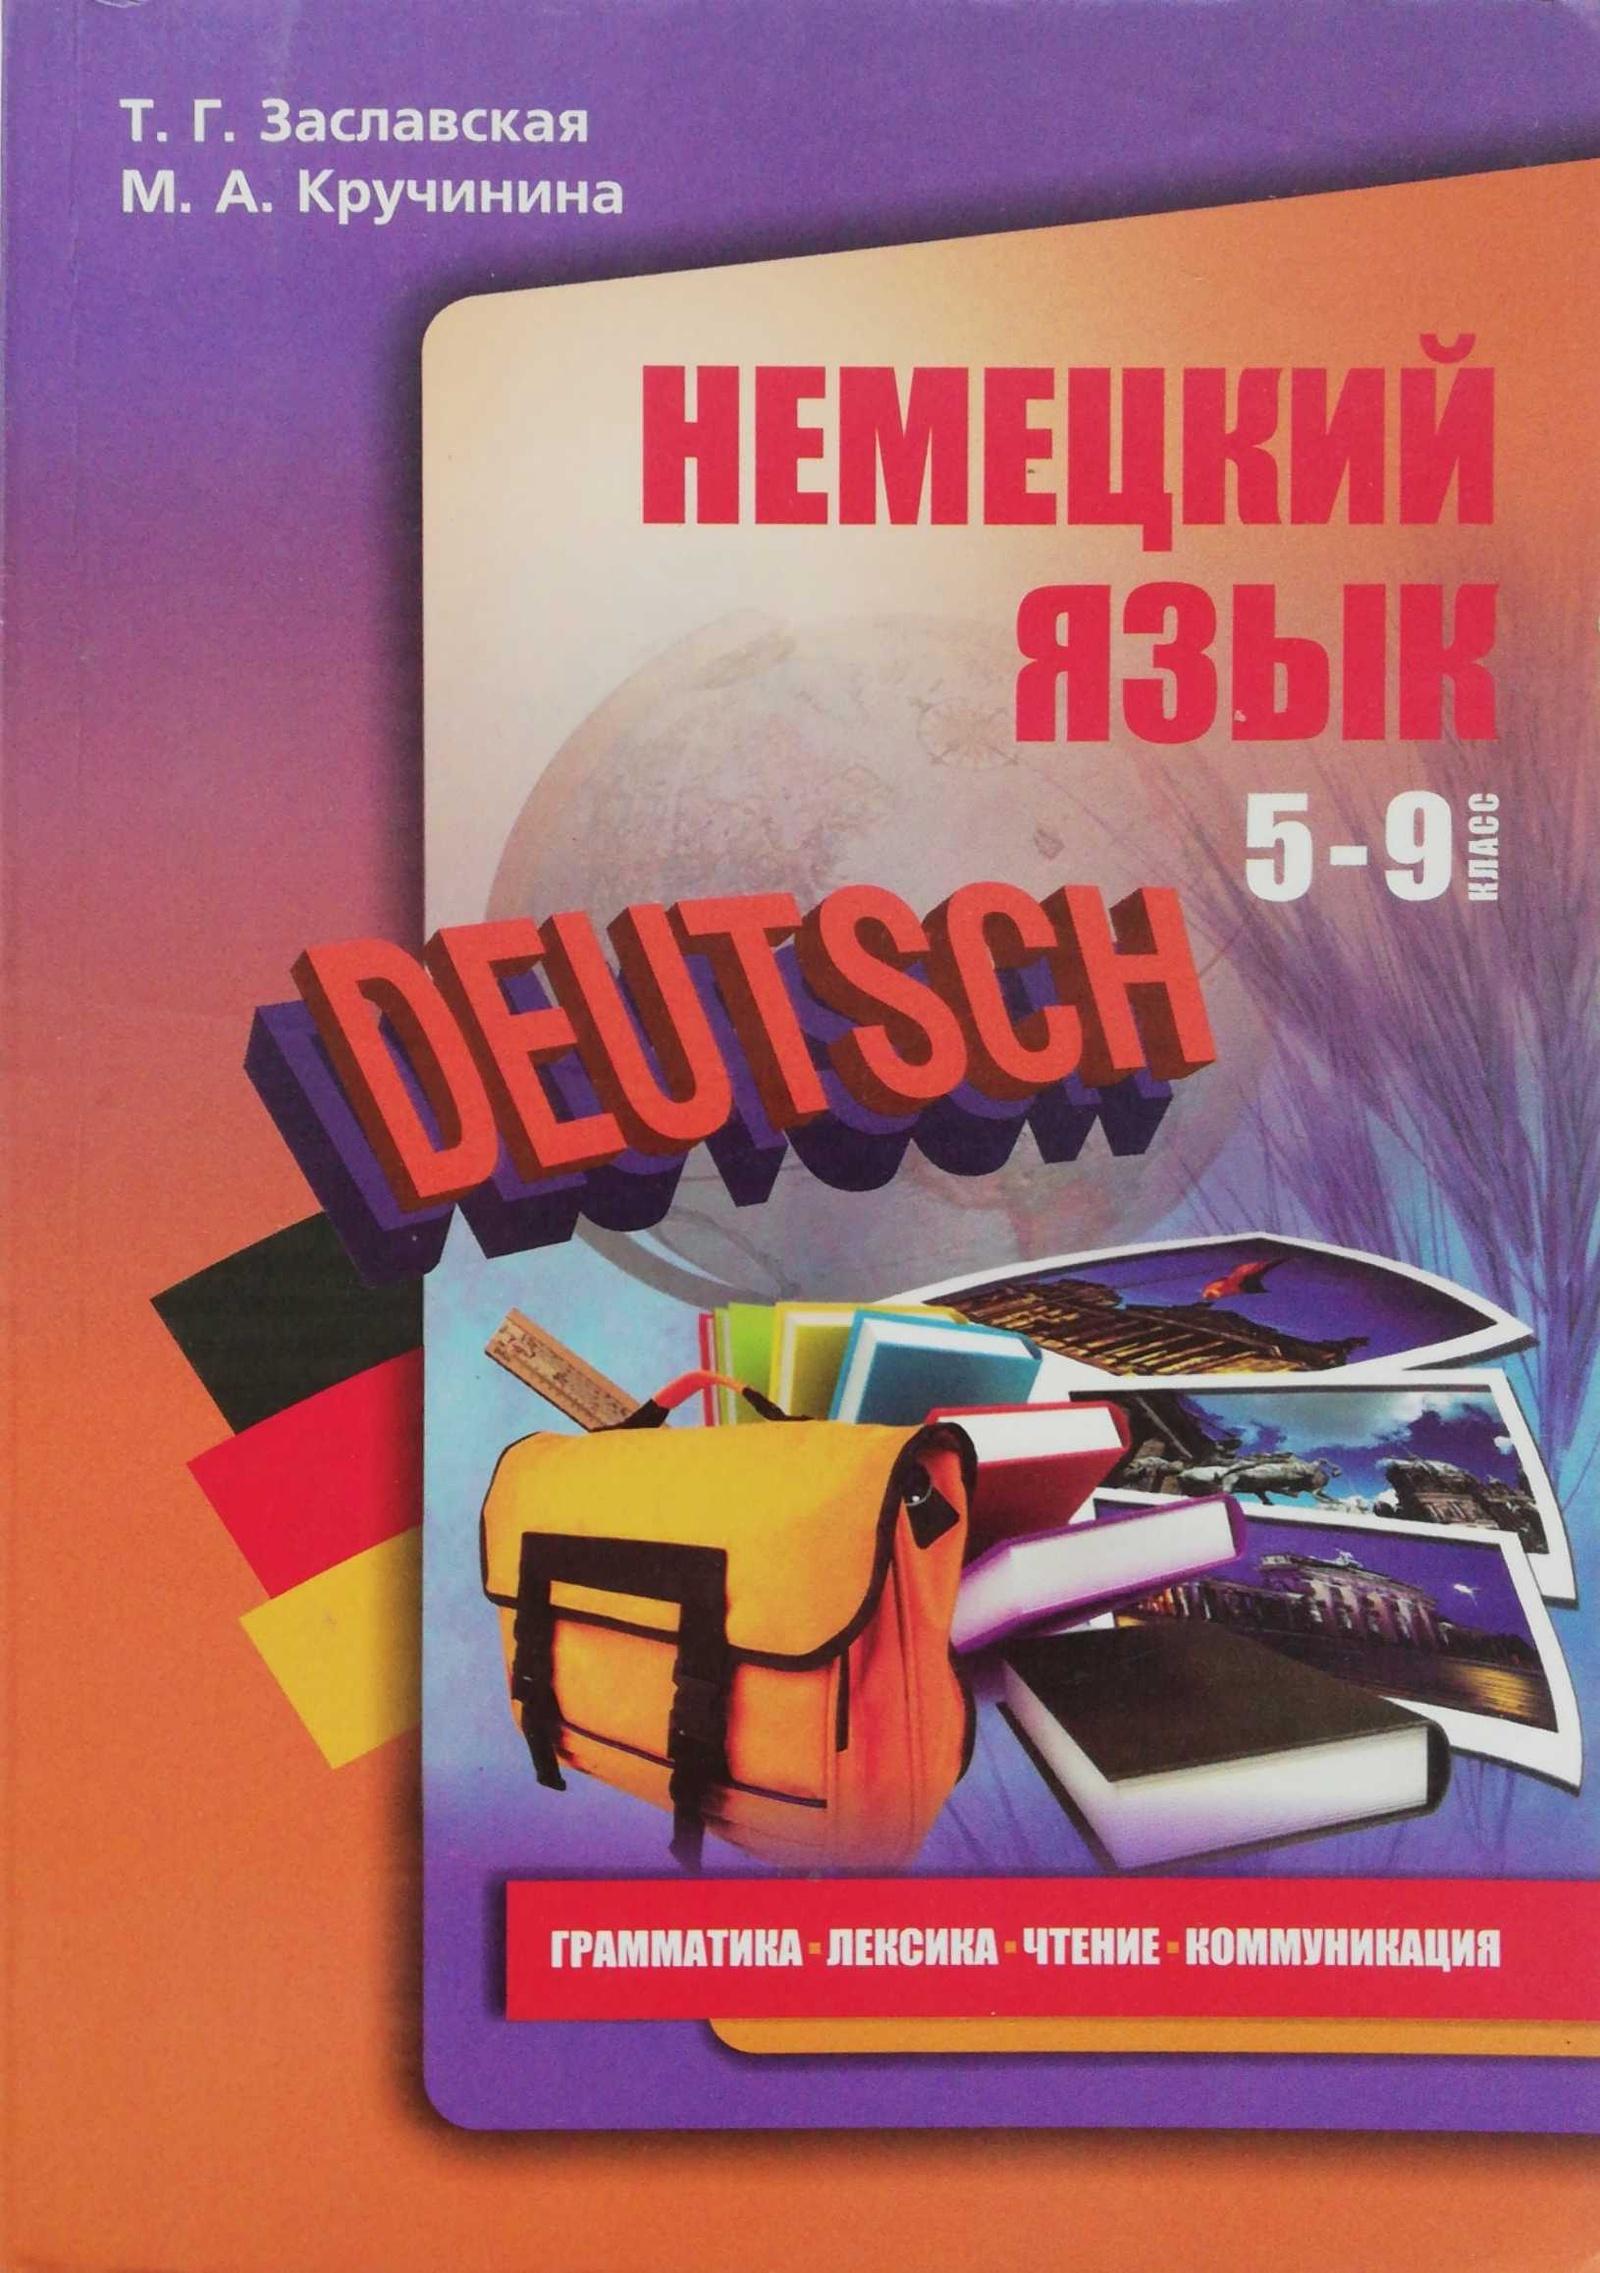 Т. Г. Заславская, М. А. Кручинина Немецкий язык : грамматика, лексика, чтение, коммуникация